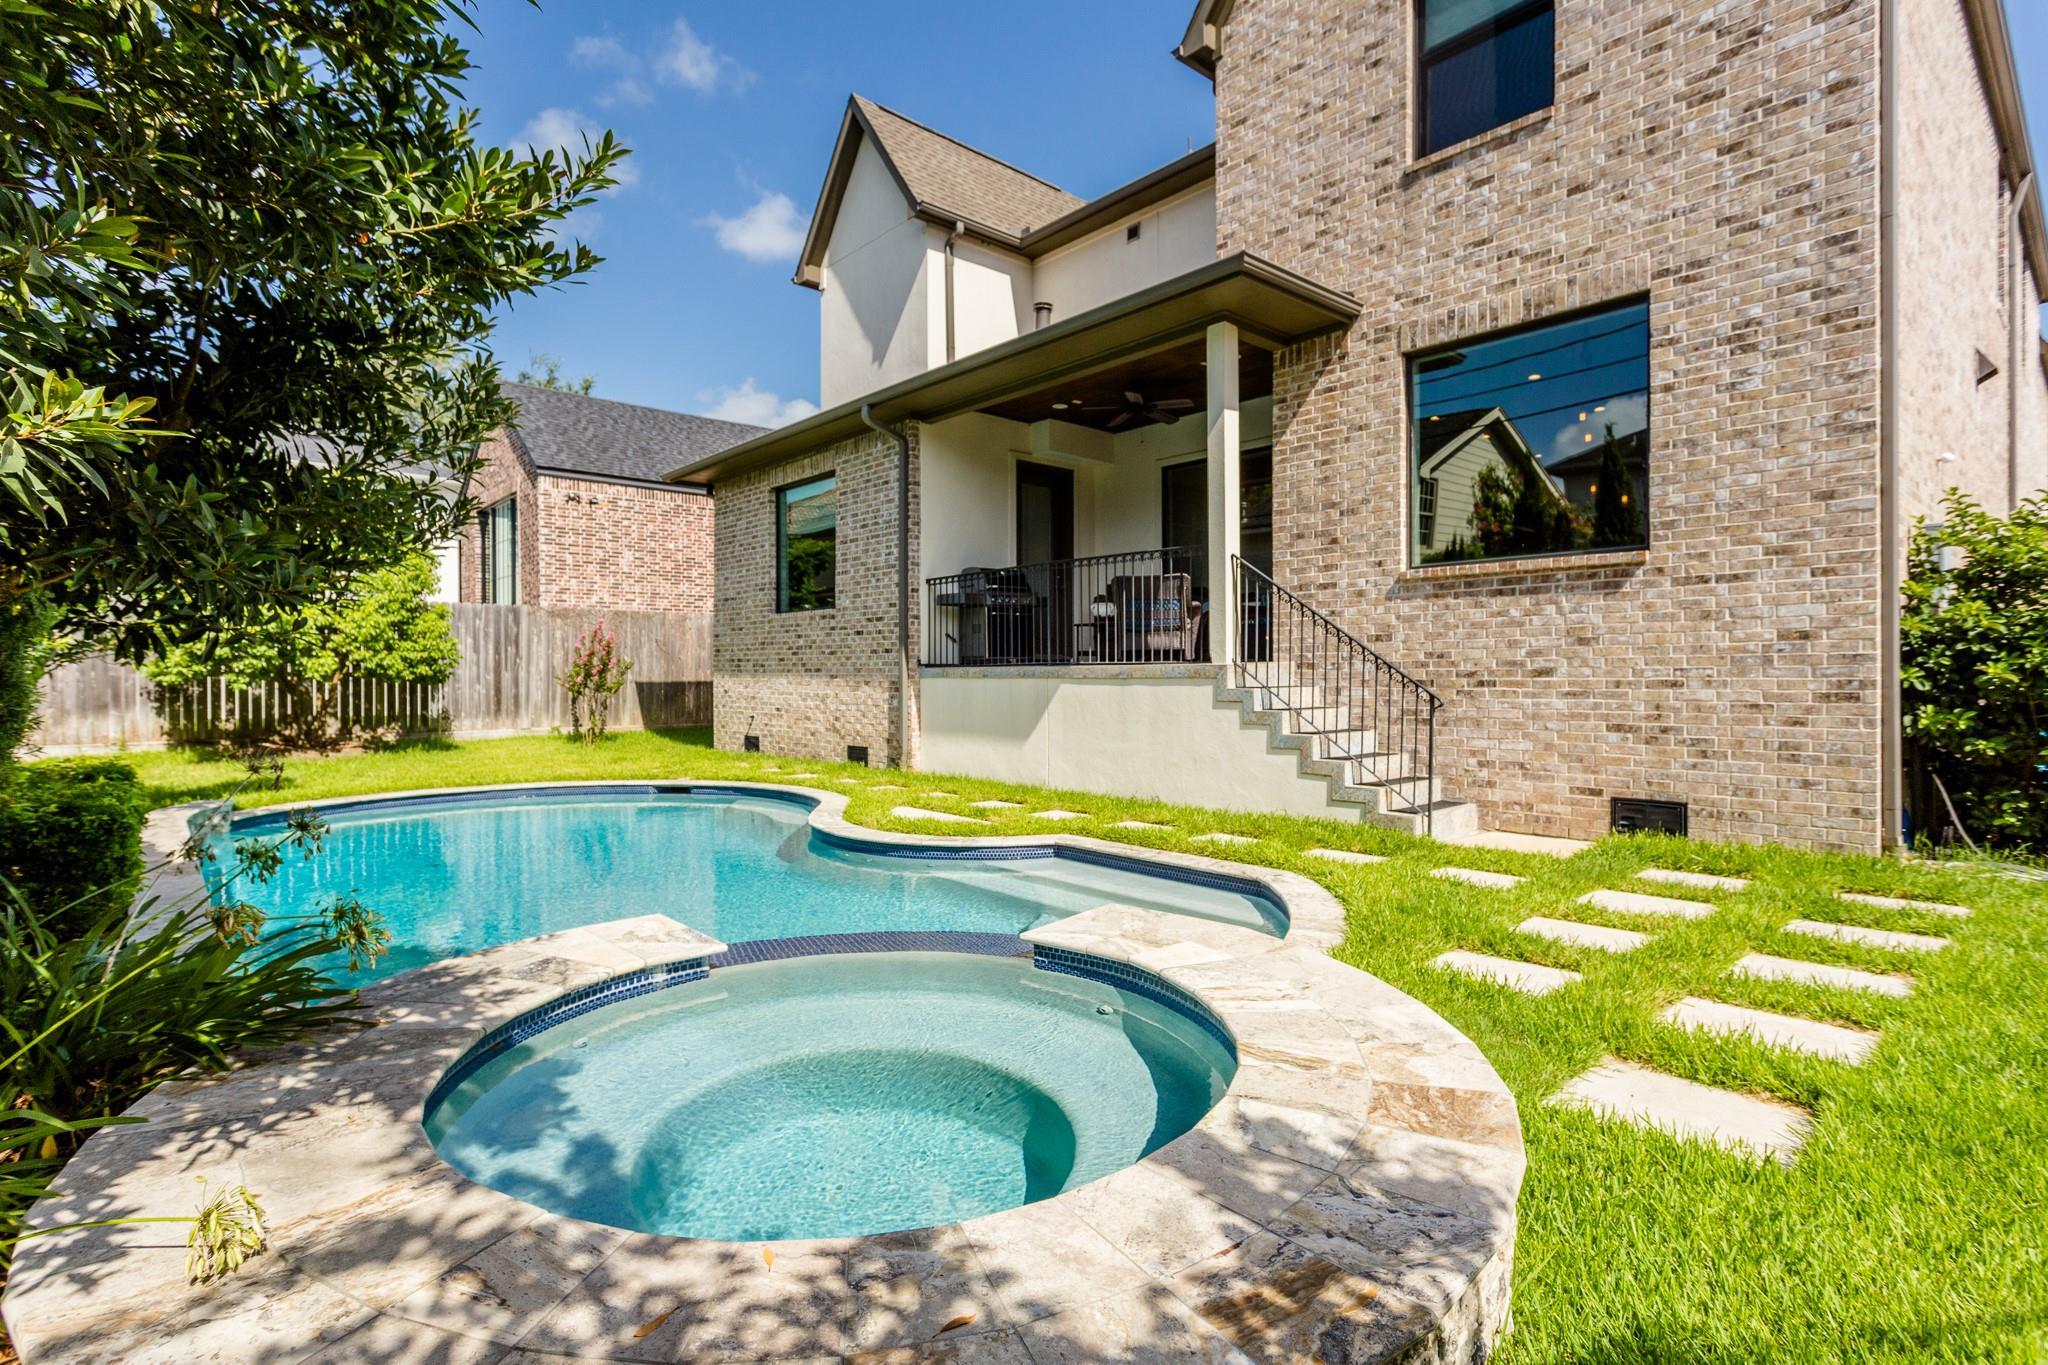 3301 GLEN HAVEN Boulevard Property Photo - Houston, TX real estate listing